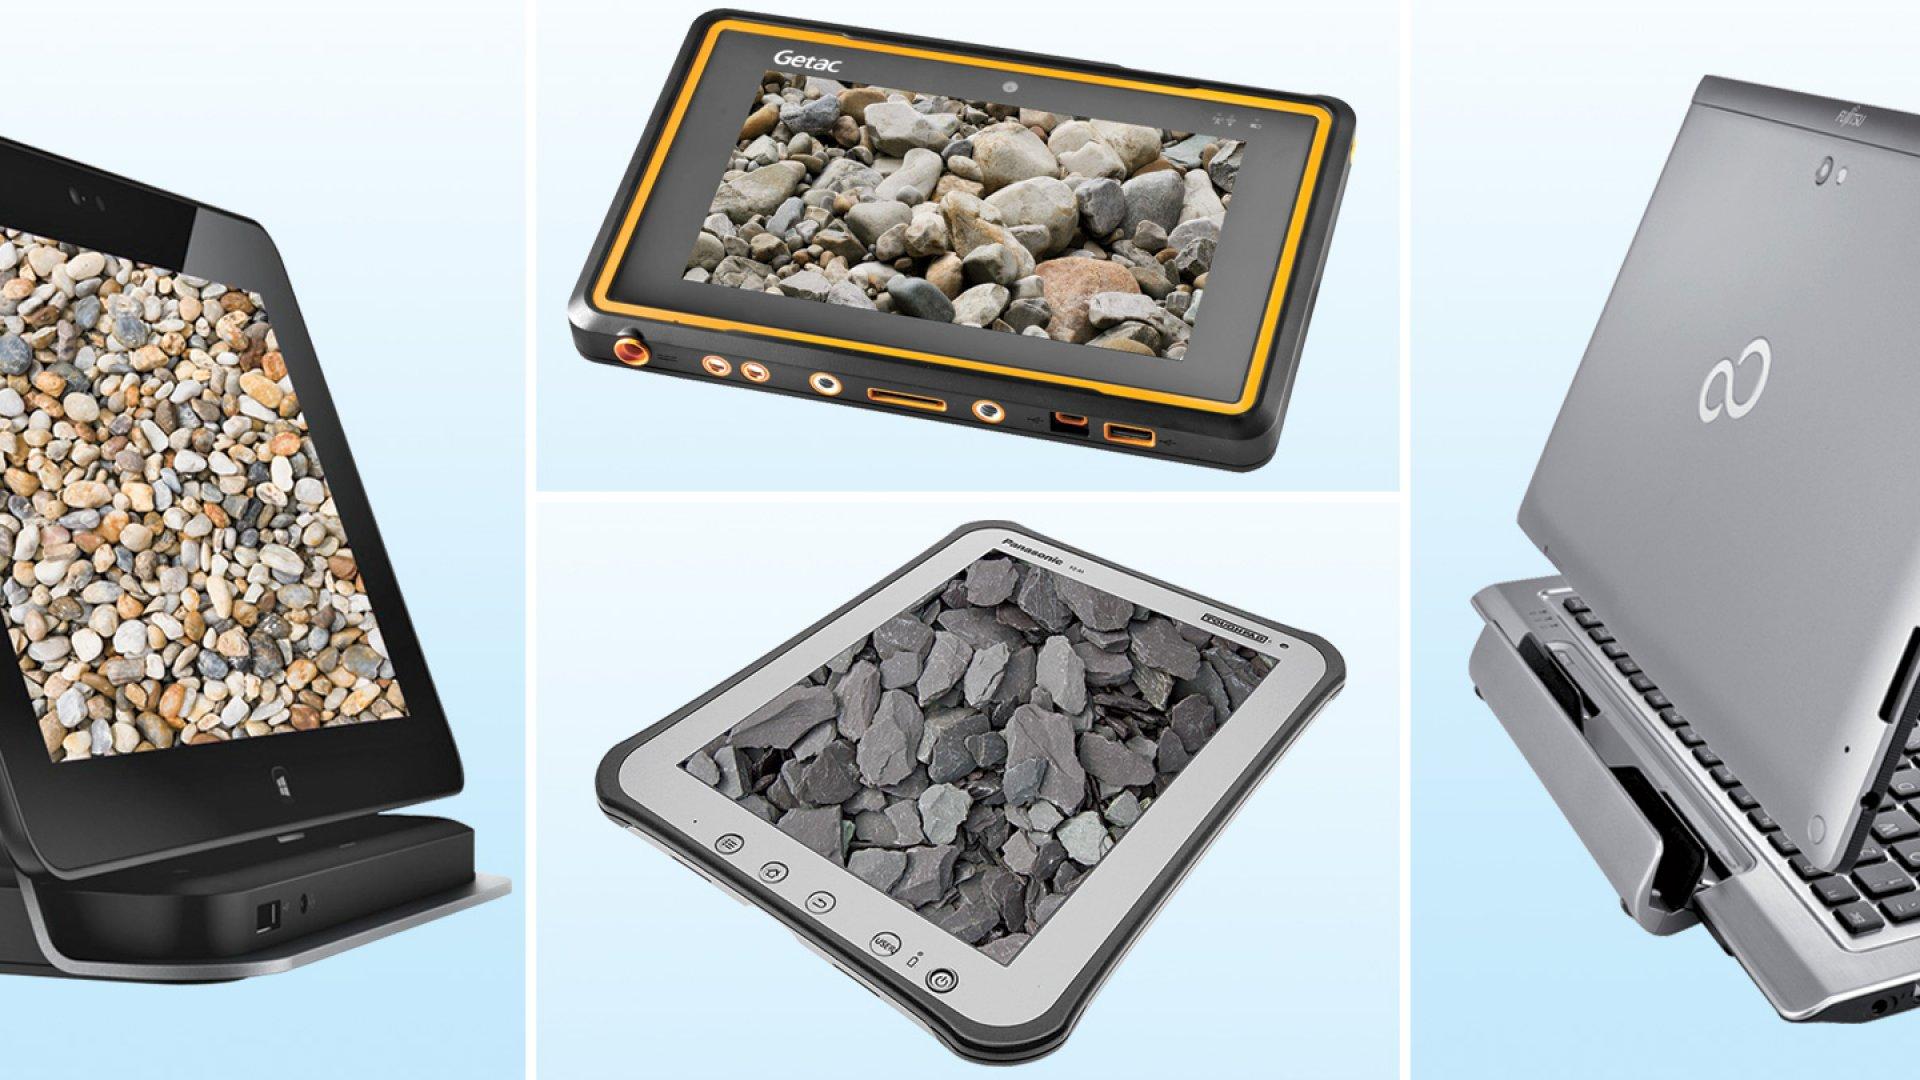 Clockwise: Dell Latitude 10, Getac Z710, Fujitsu Stylistic Q702, Panasonic Toughpad FZ-A1.